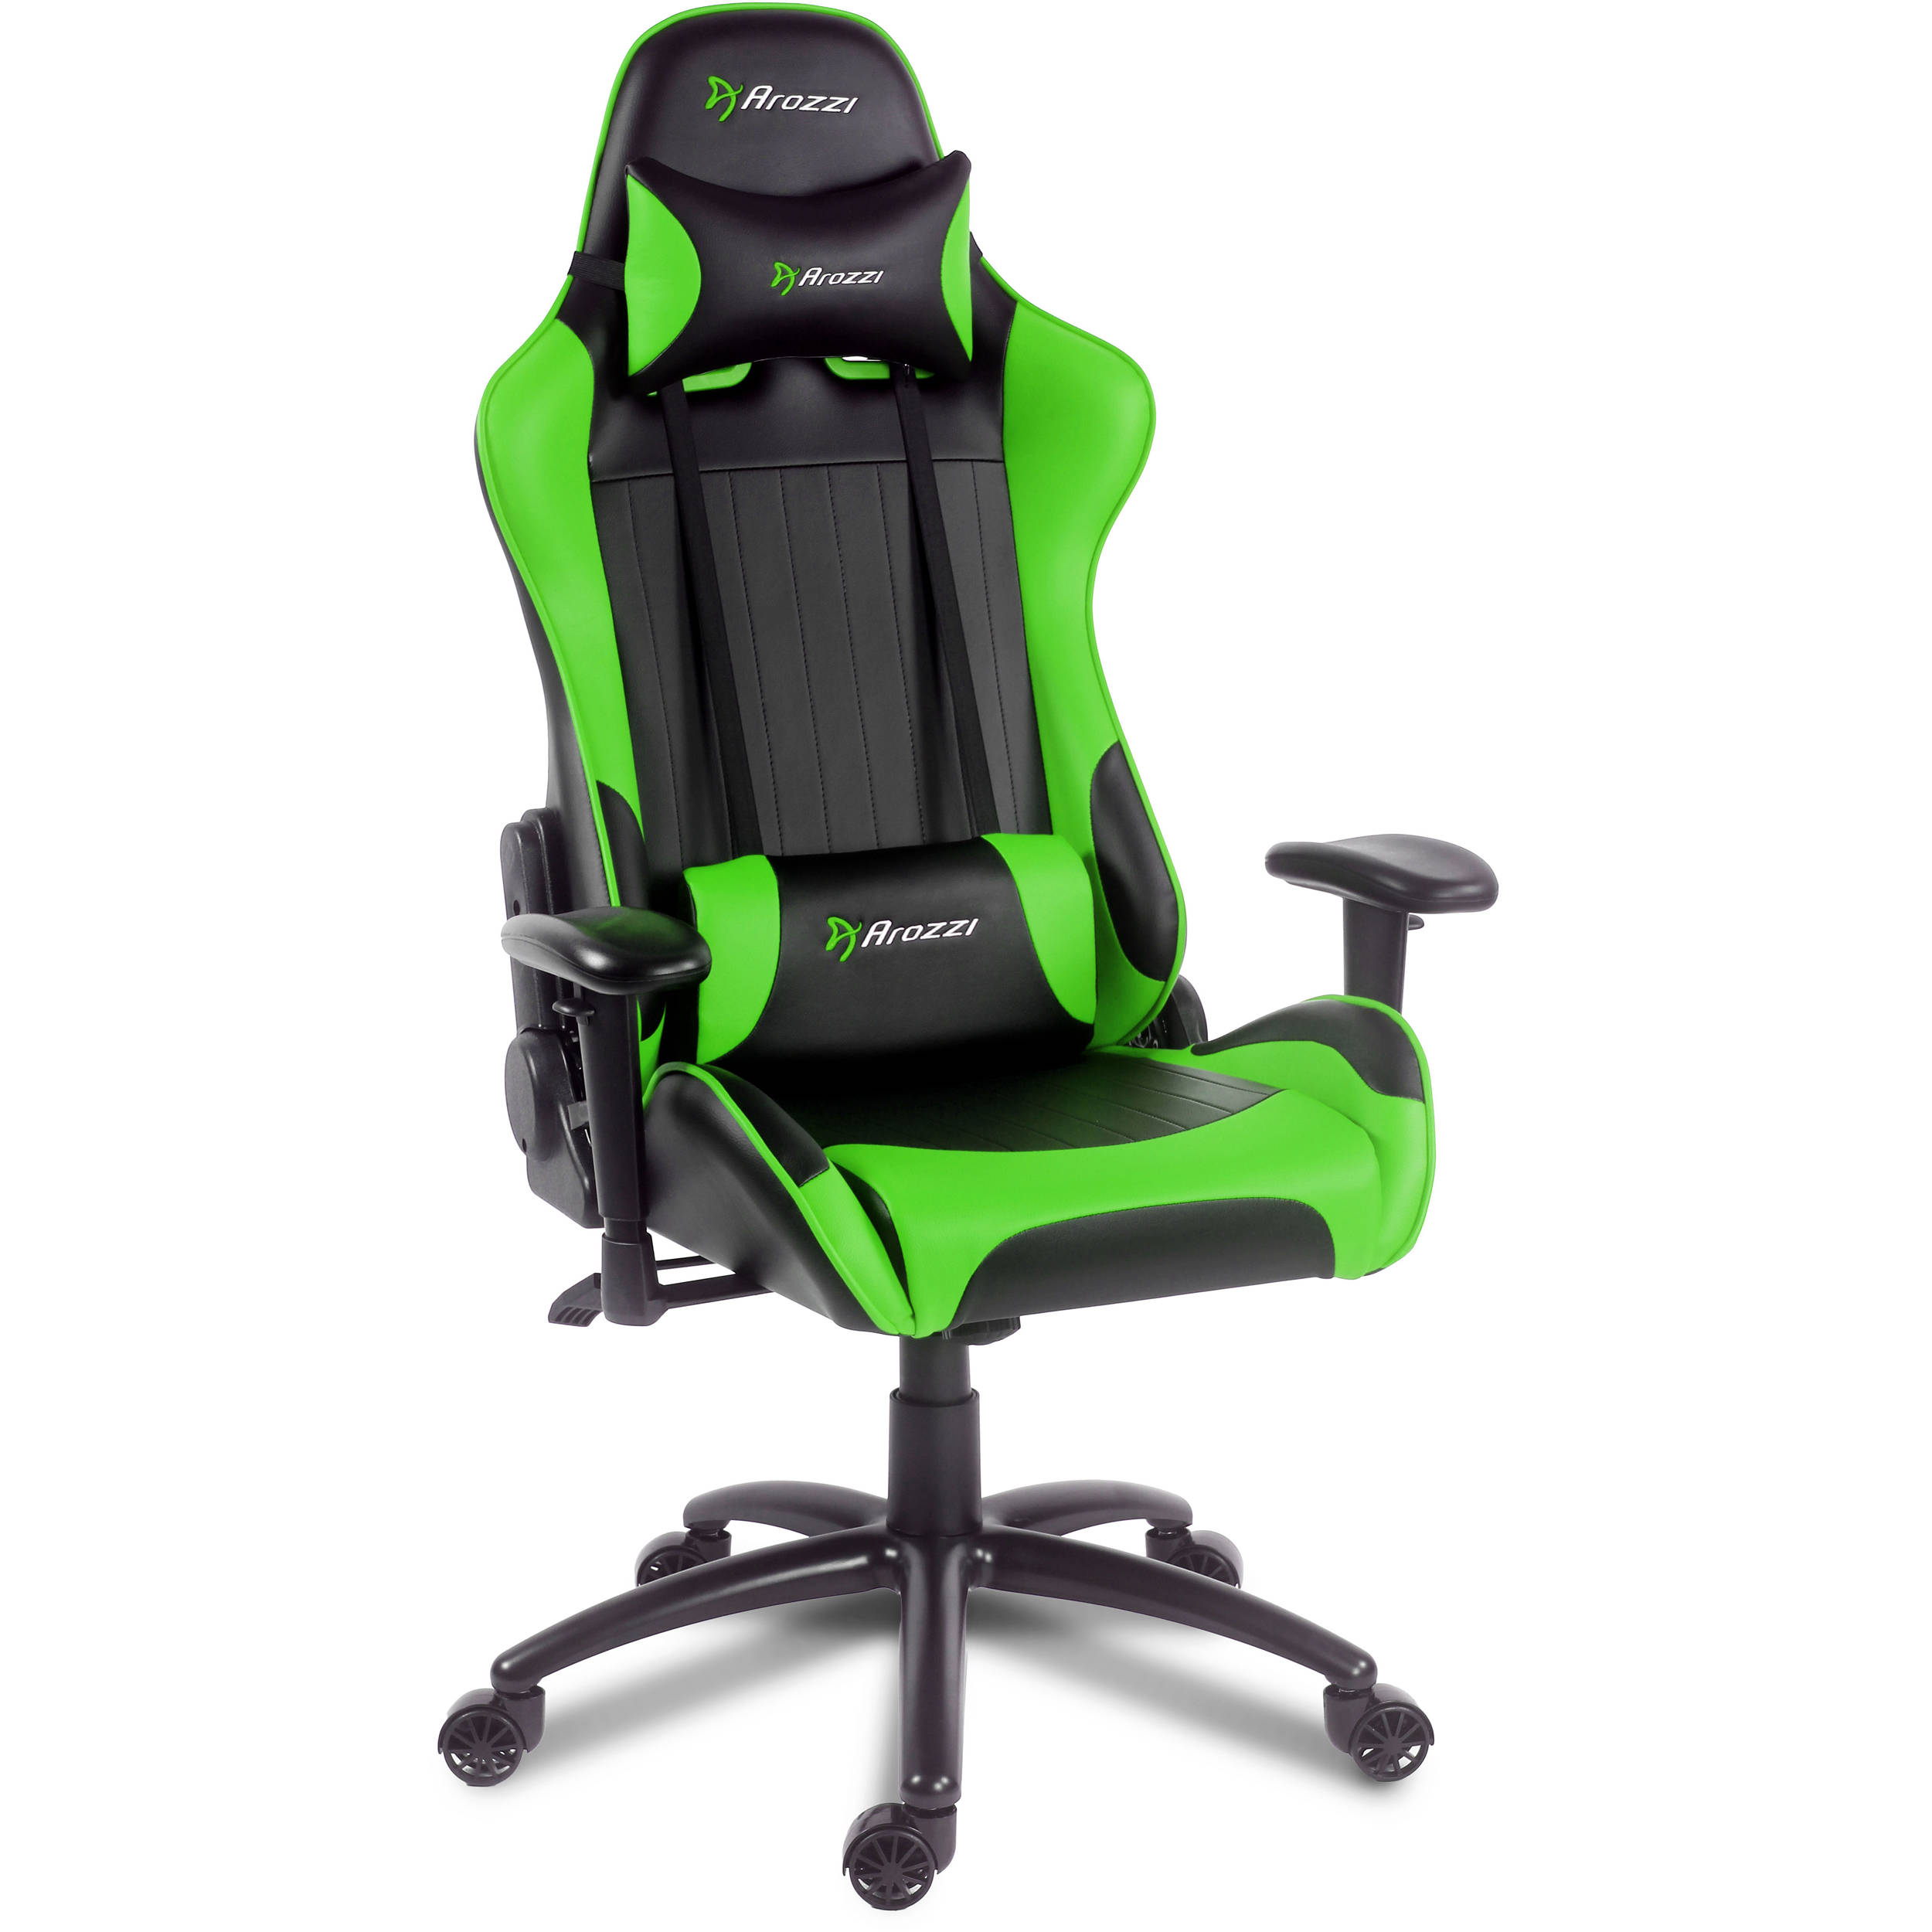 Enjoyable Arozzi Verona Gaming Chair Green Verona Gn Inzonedesignstudio Interior Chair Design Inzonedesignstudiocom